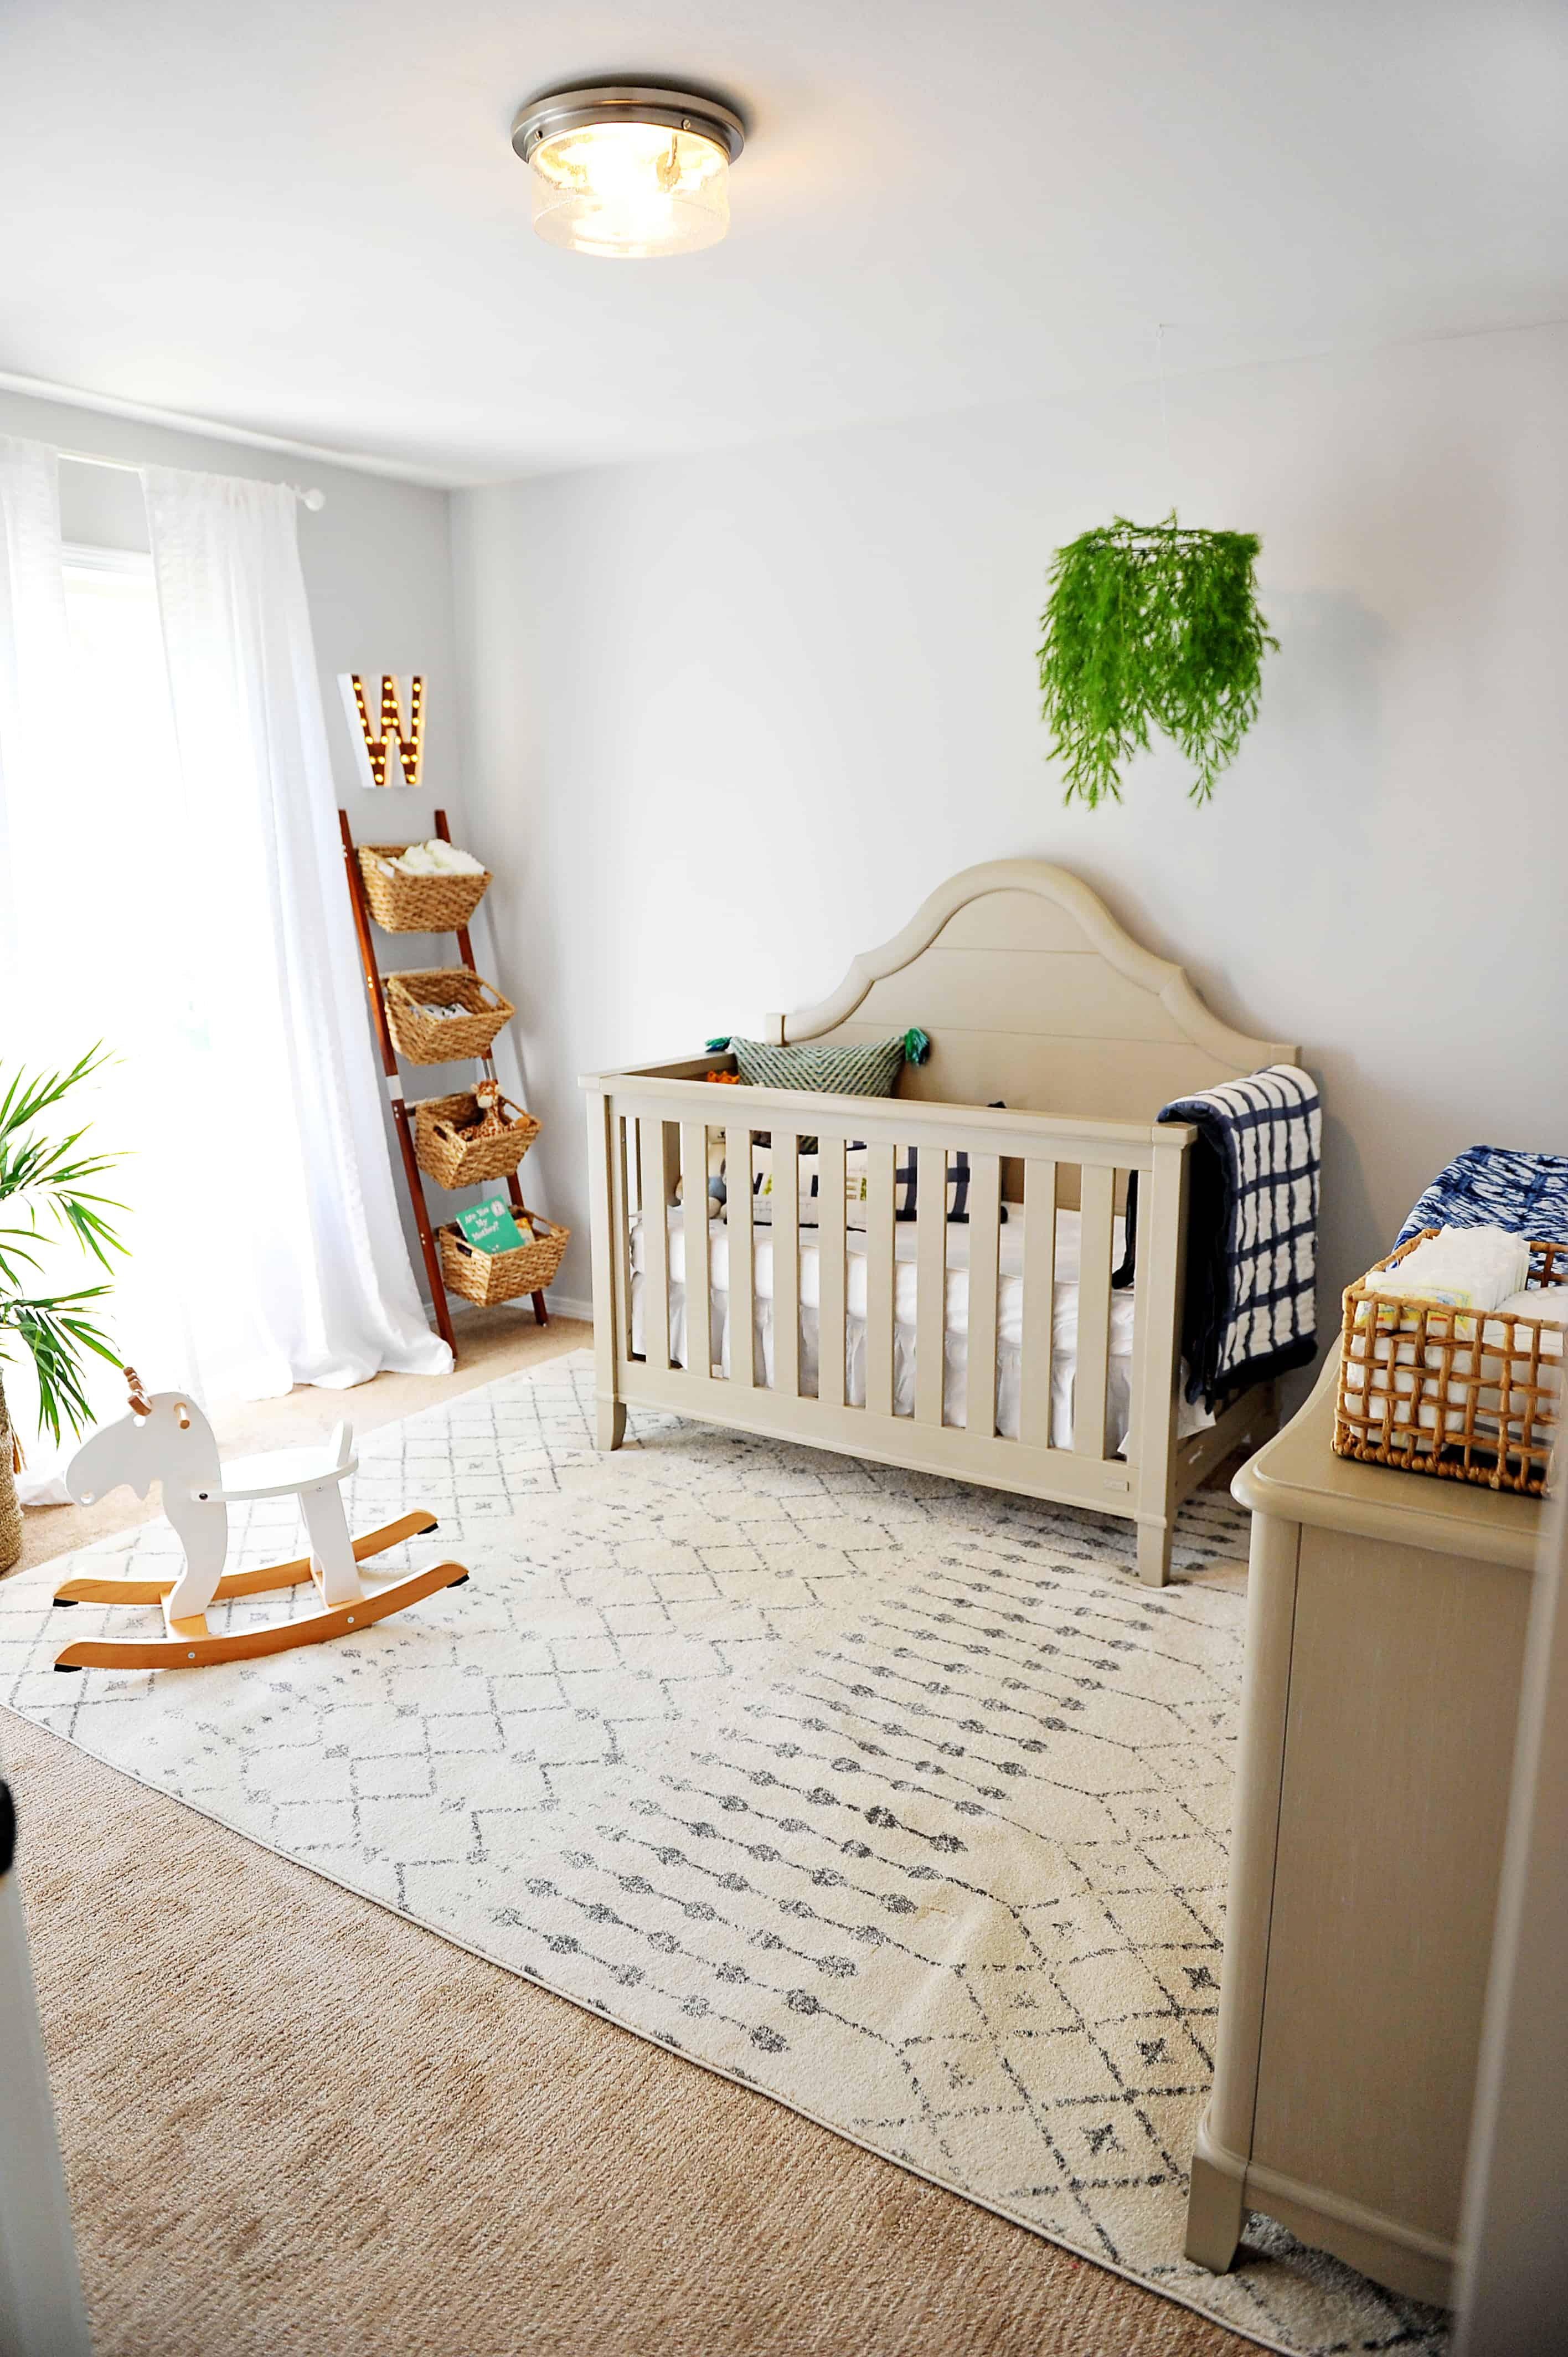 Walker Nursery - www.arinsolangeathome.com